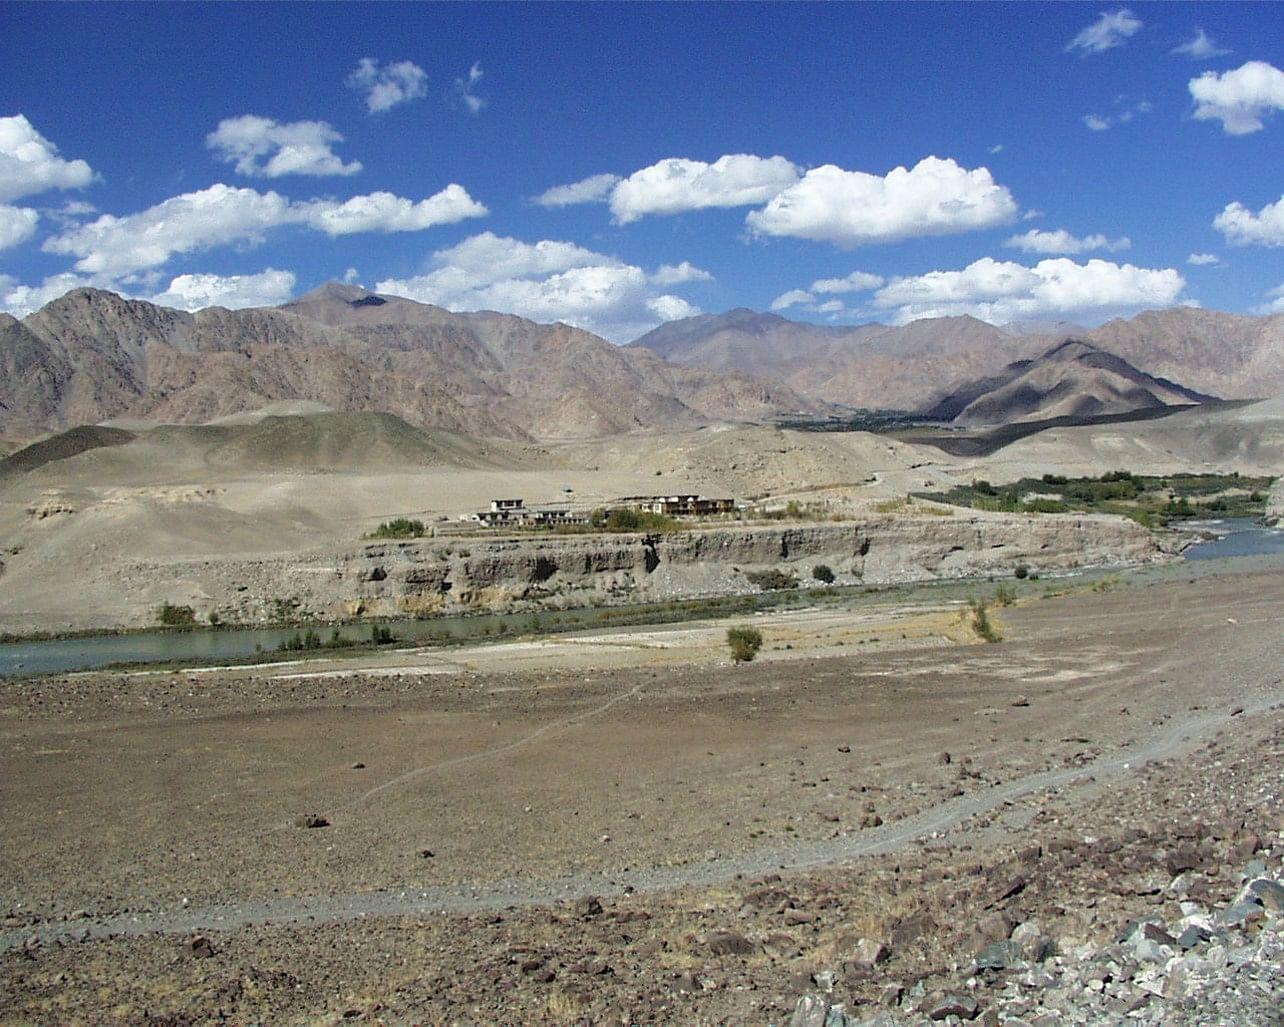 Typical landscape of Ladakh near SECMOL school.